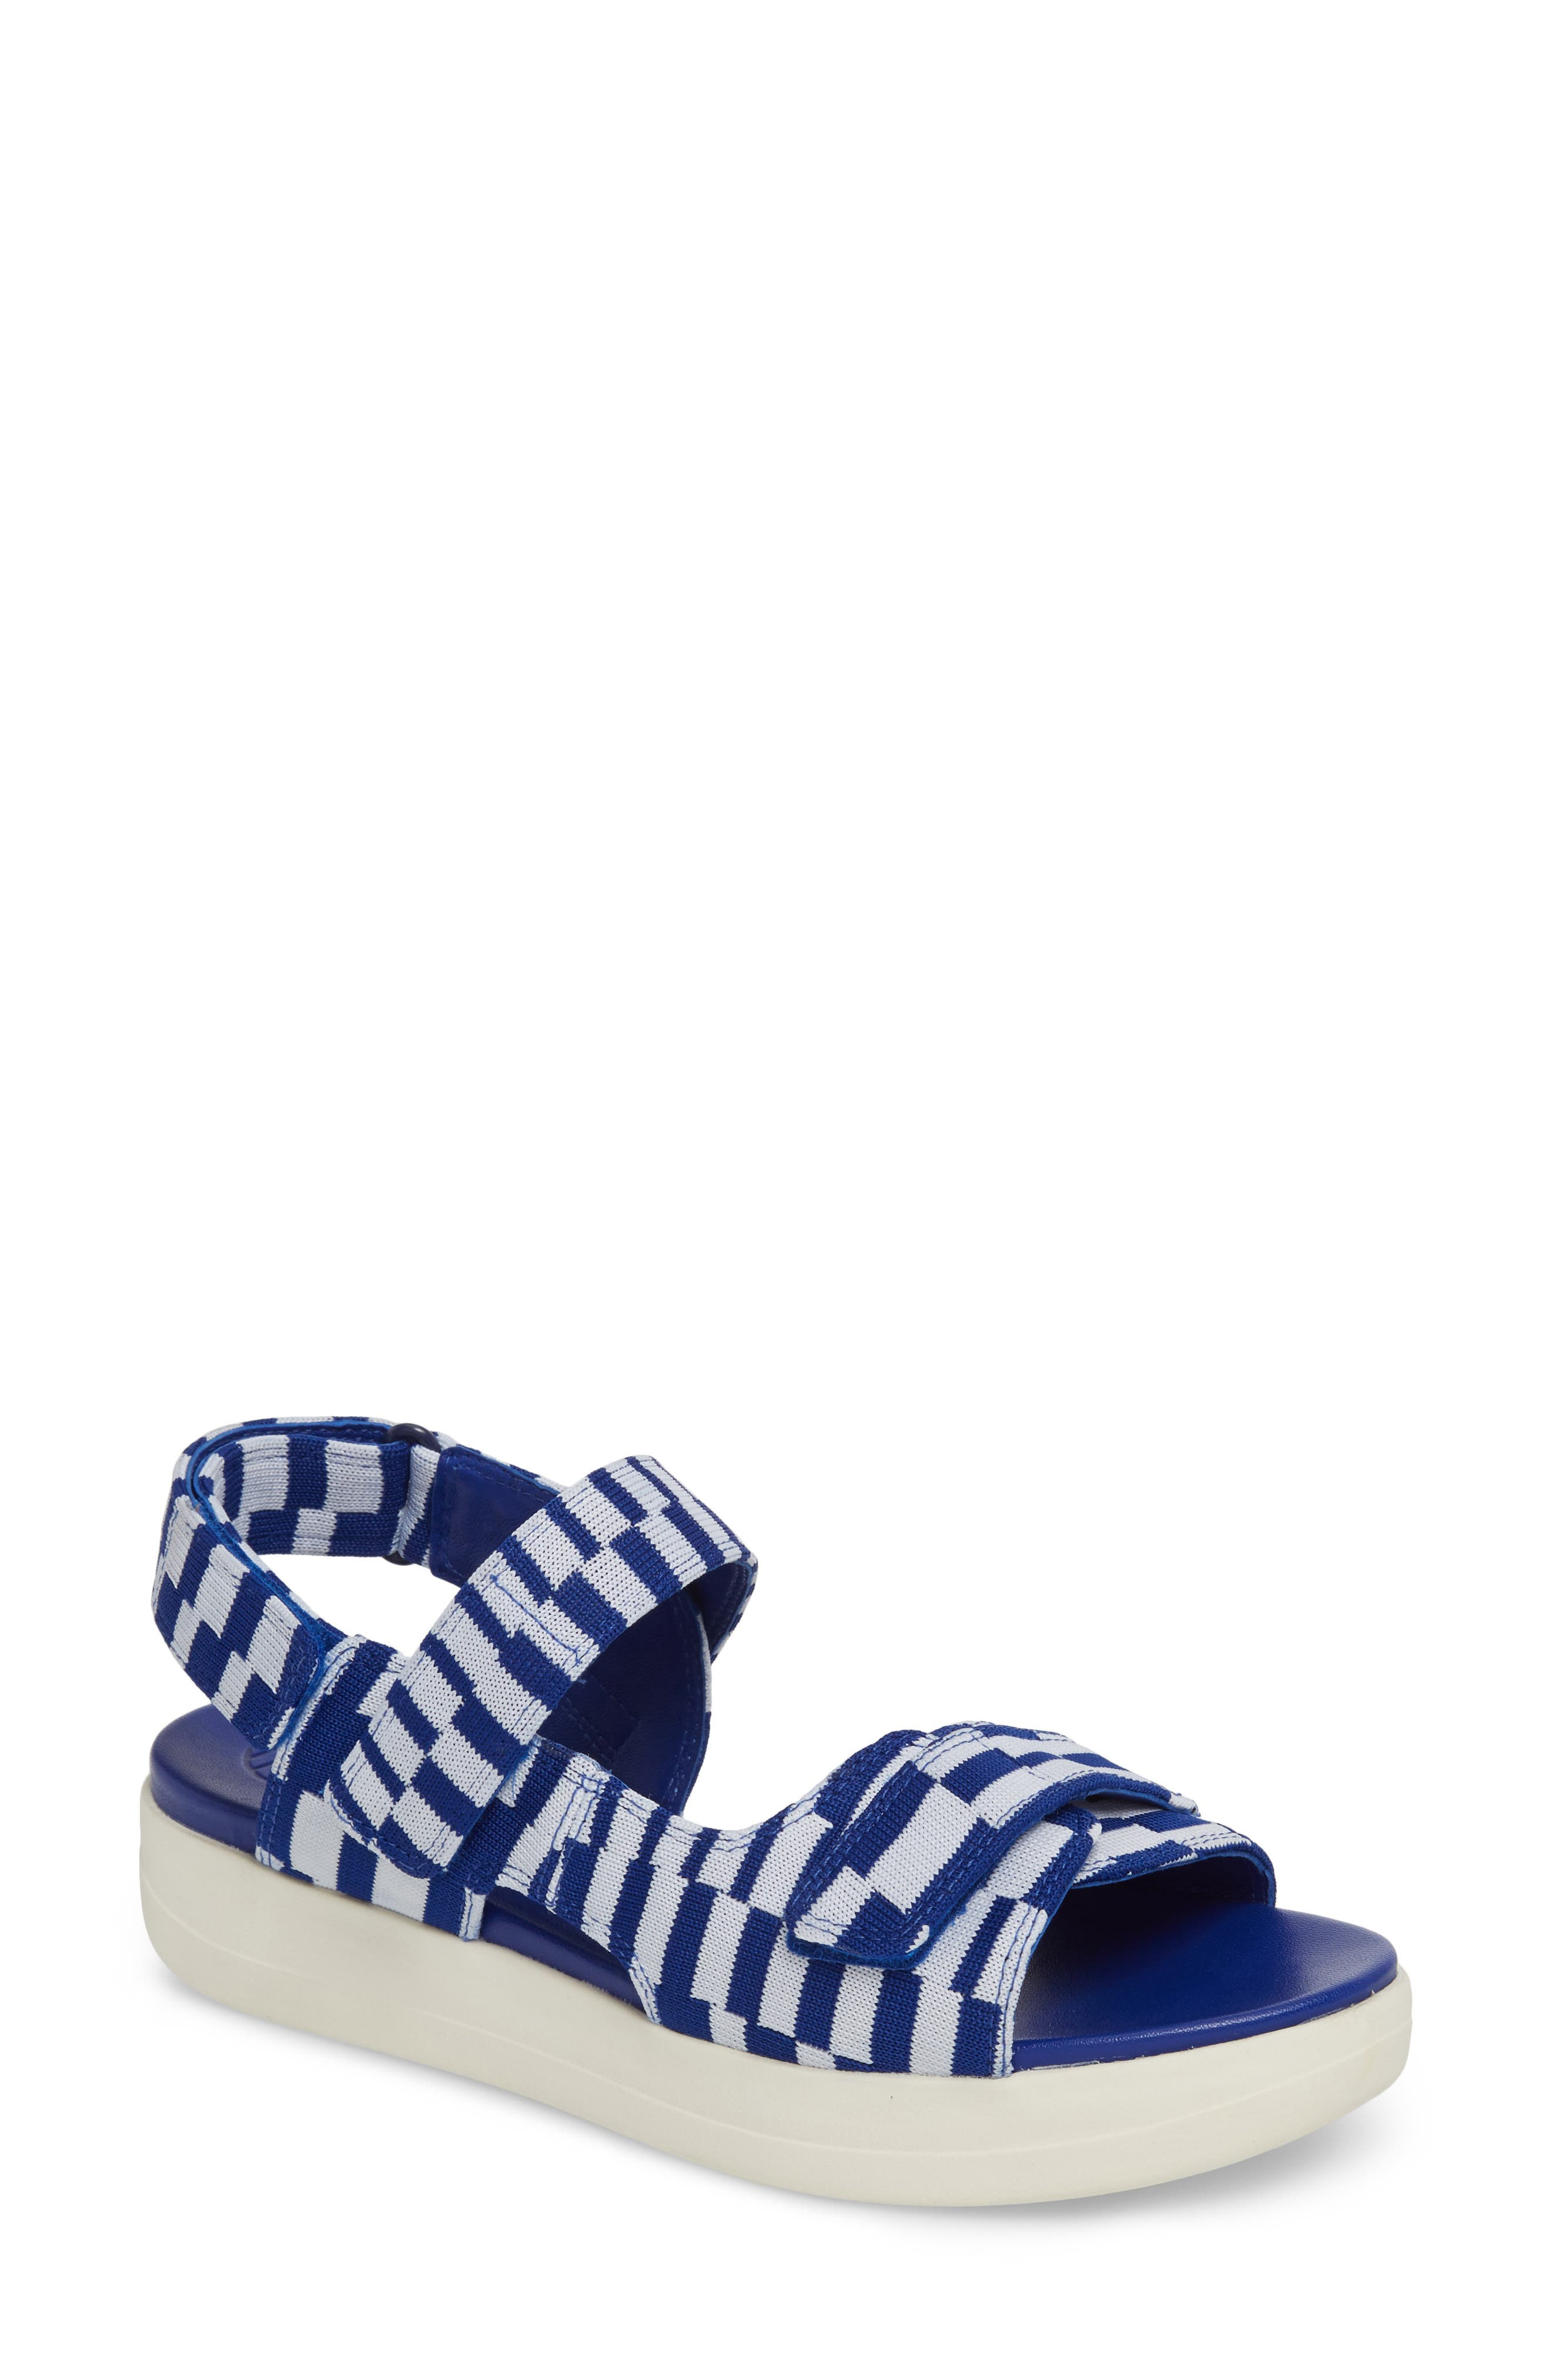 Tory Sport Flatform Sandal (Women)